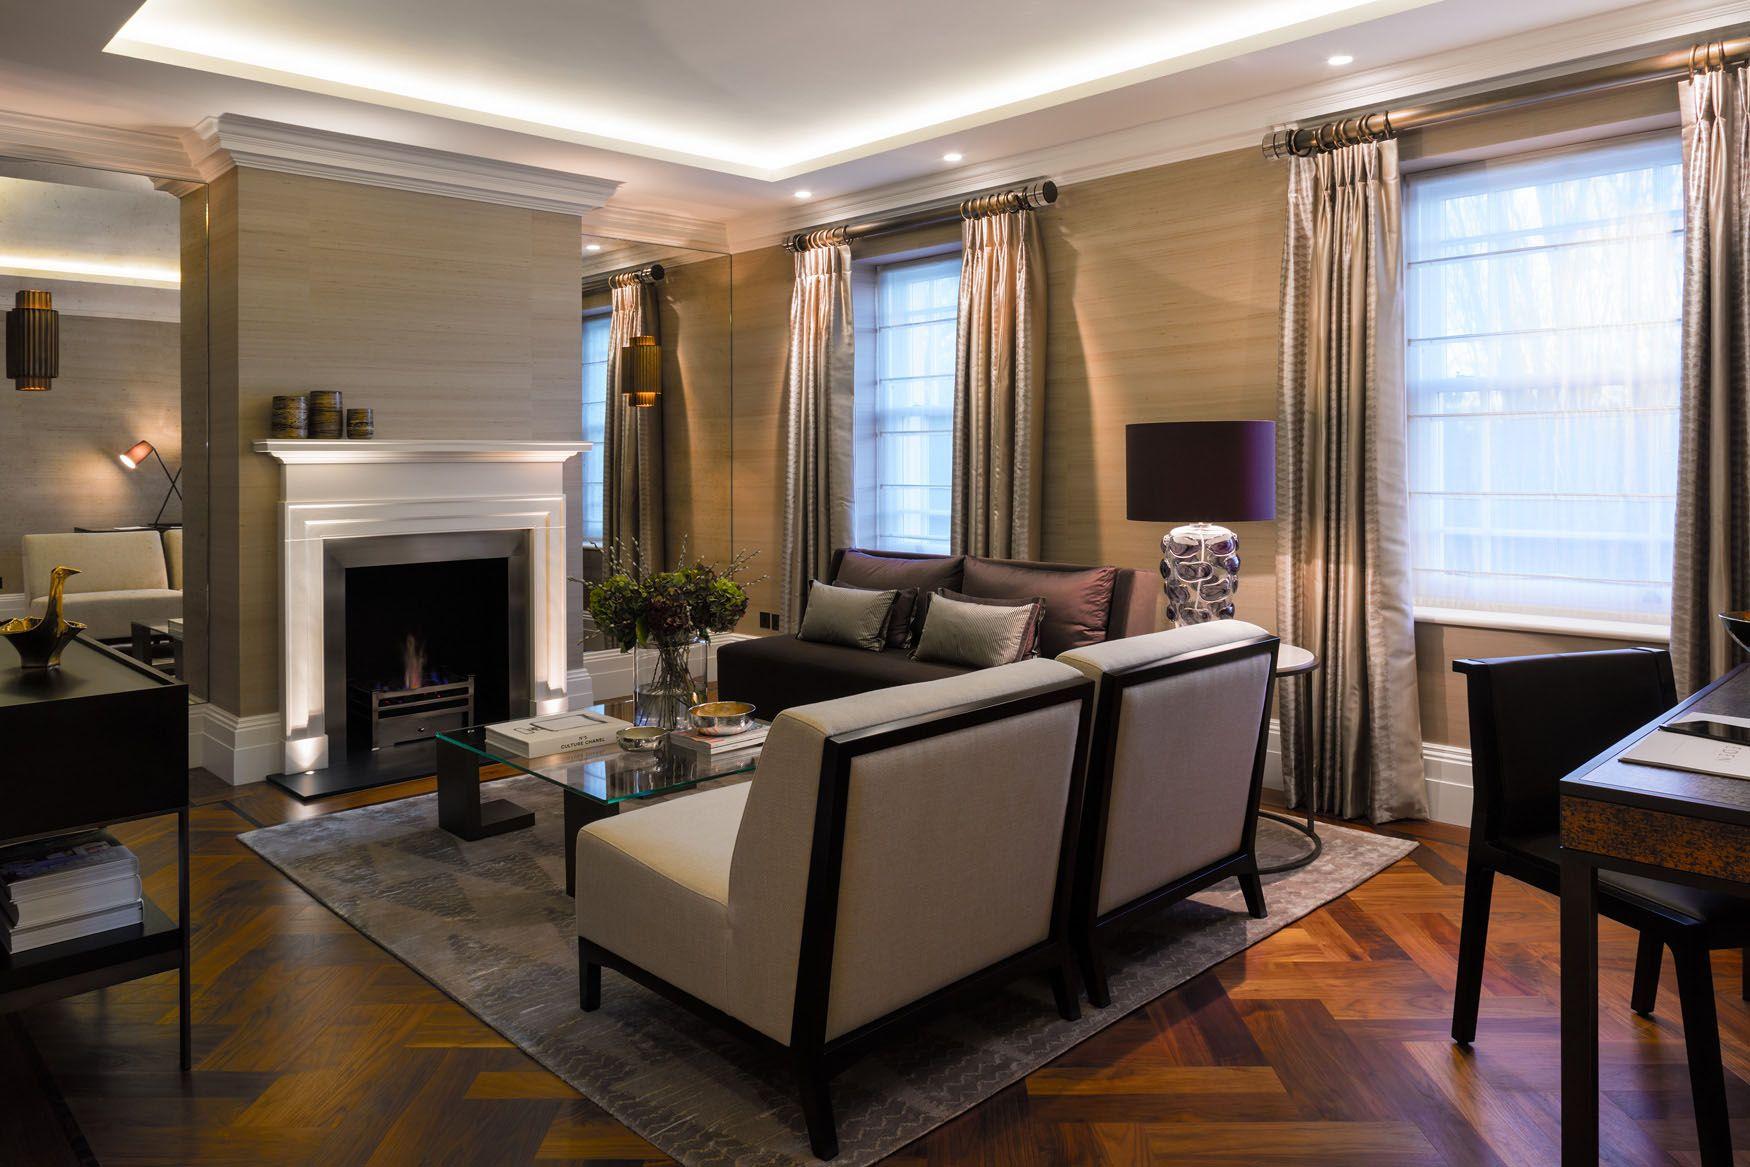 Honky  Interior Design Showcase  Дизайн Интерьера  Pinterest Amusing Living Room Showcase Designs Images Decorating Design